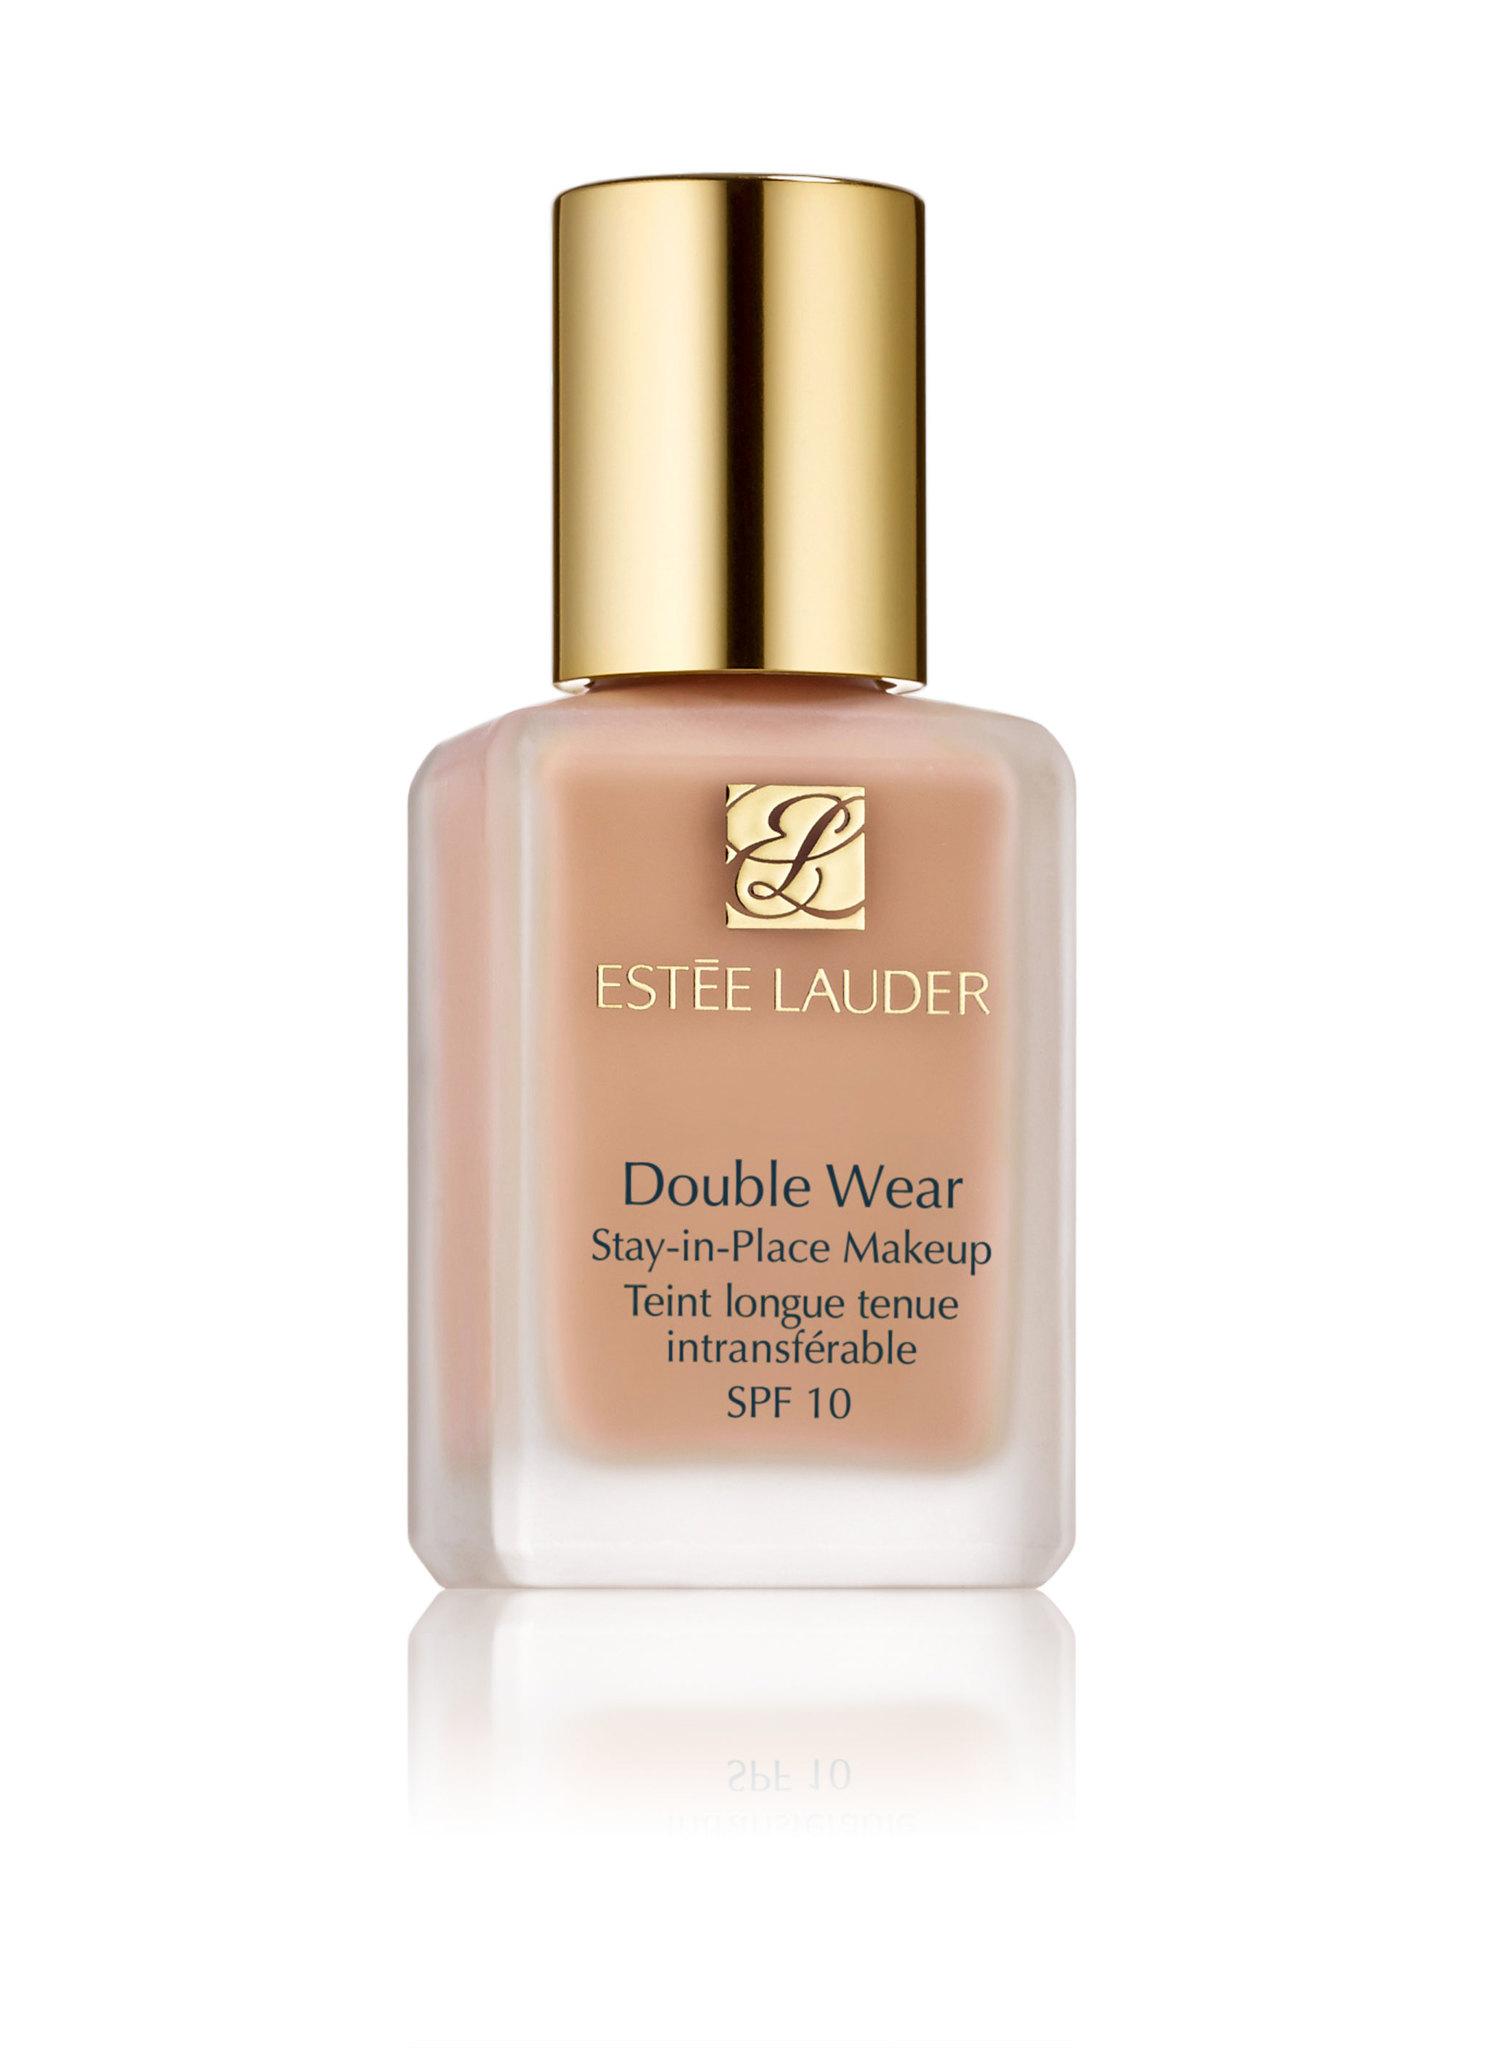 Estée Lauder Double Wear Stay-In-Place Makeup Foundation, 4C1 outdoor beige